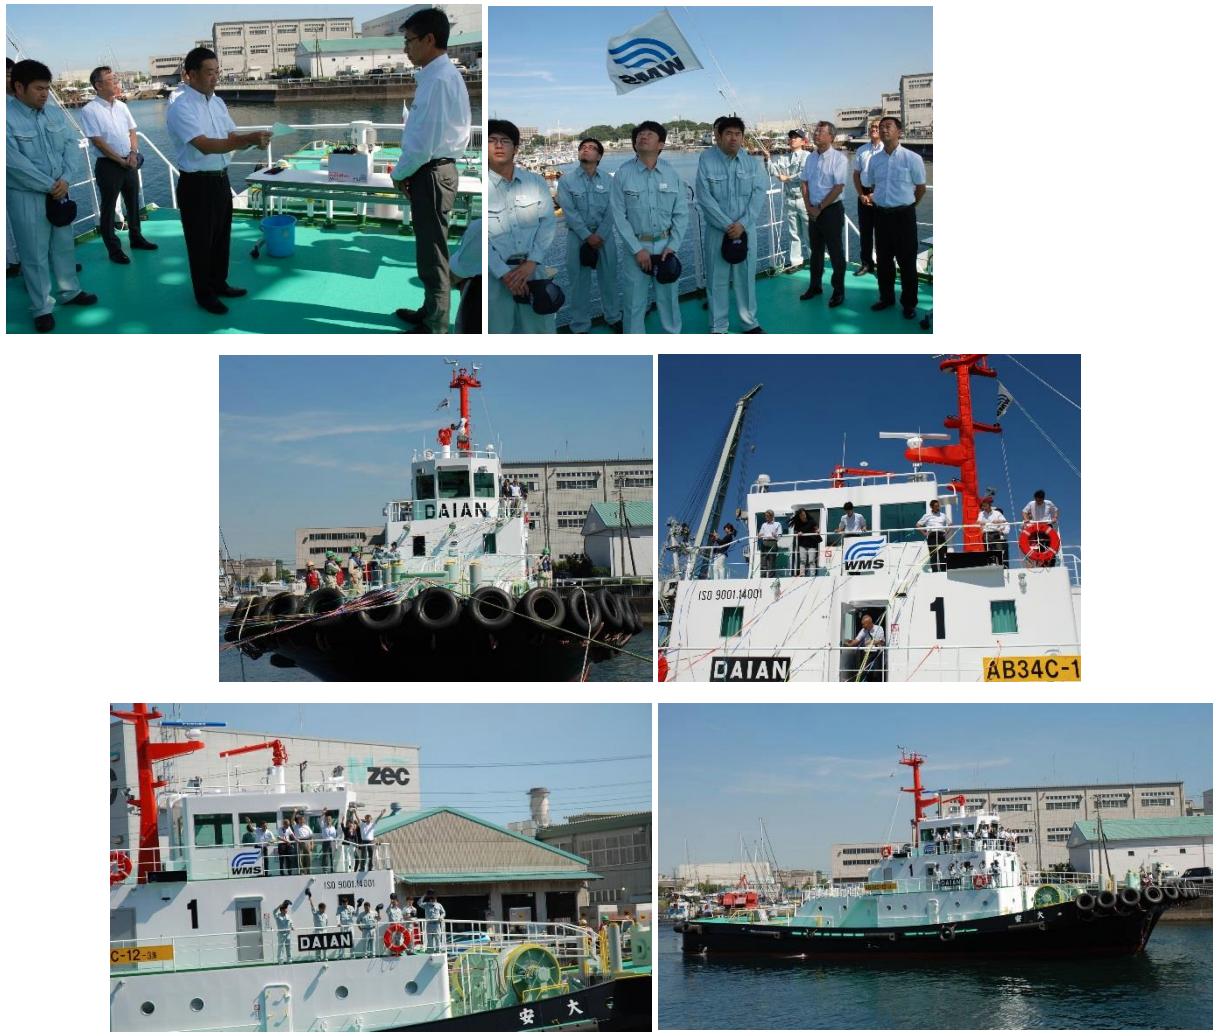 S-326番船「大安」の引渡式が行われました